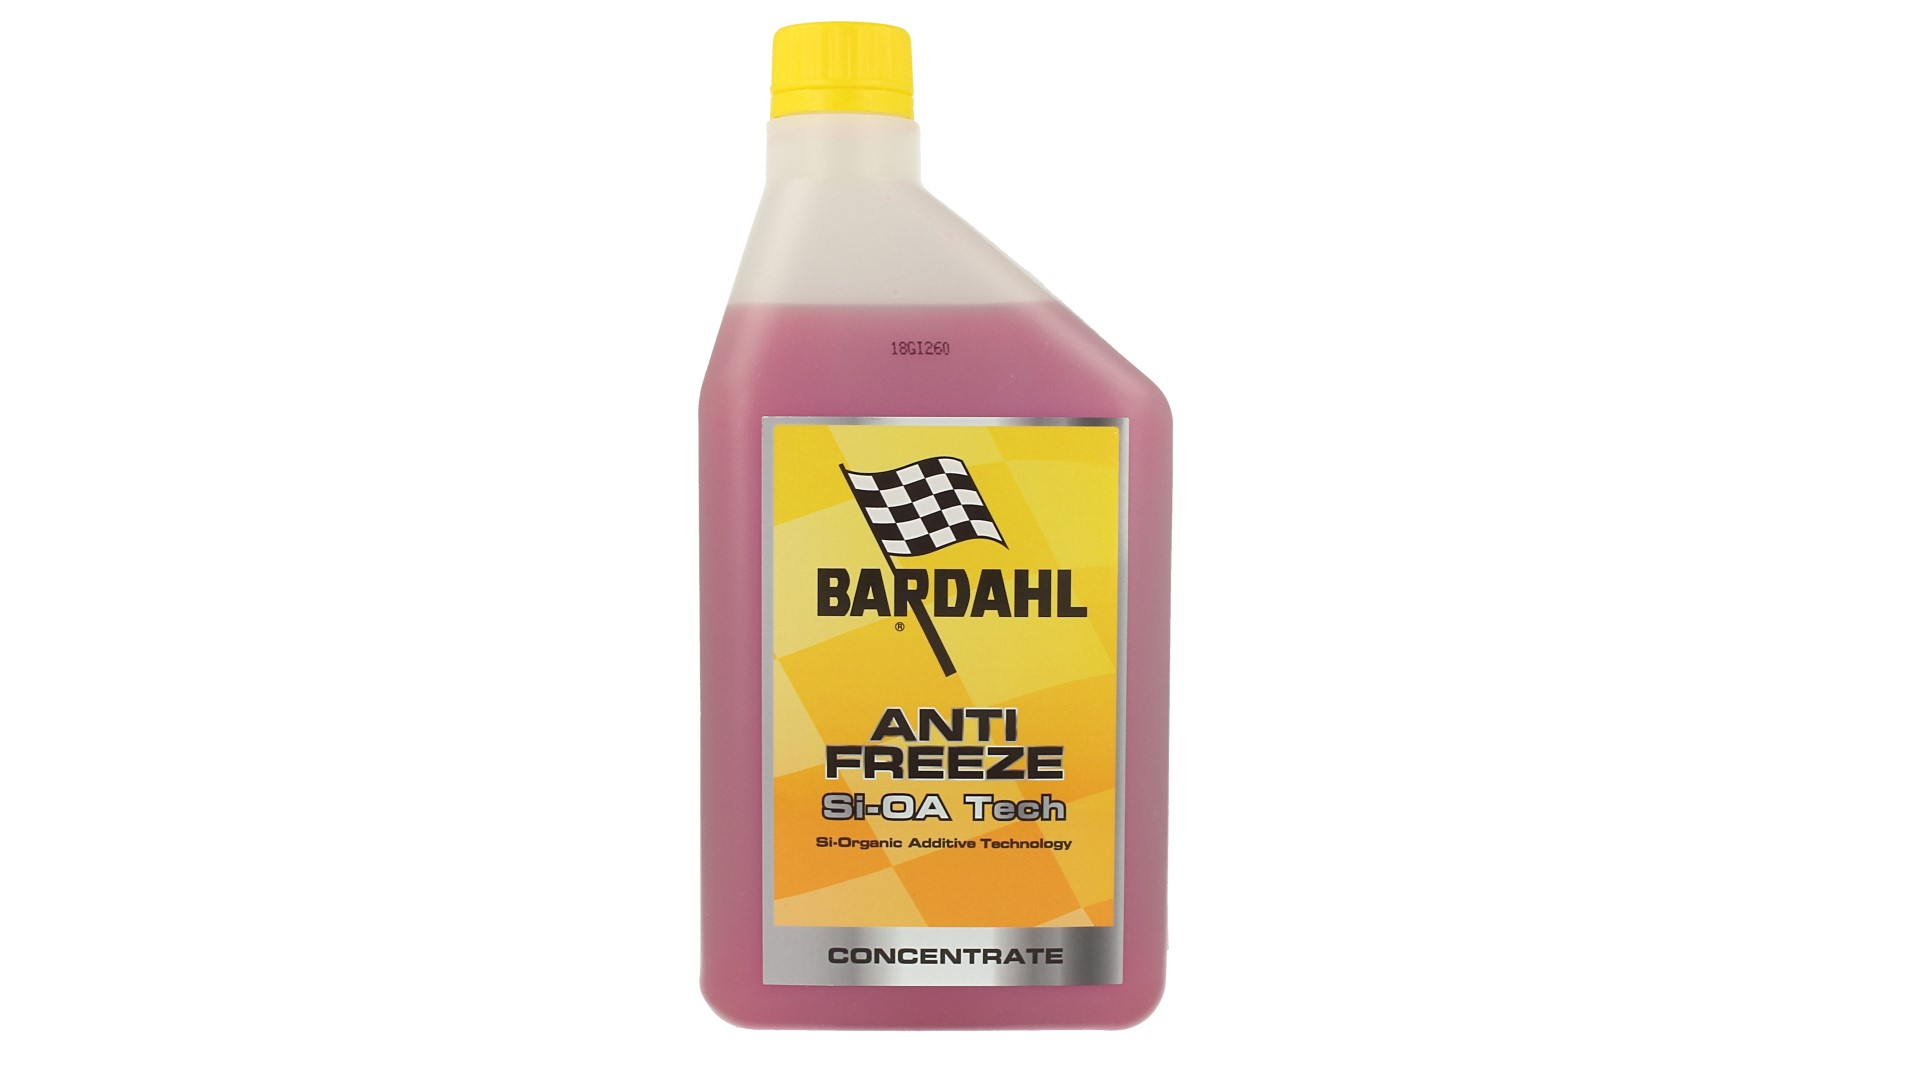 BARDAHL Antifreeze Si-OA Tech Antigelo Viola Concentrato -37°C +108°C 1 LT - PZ